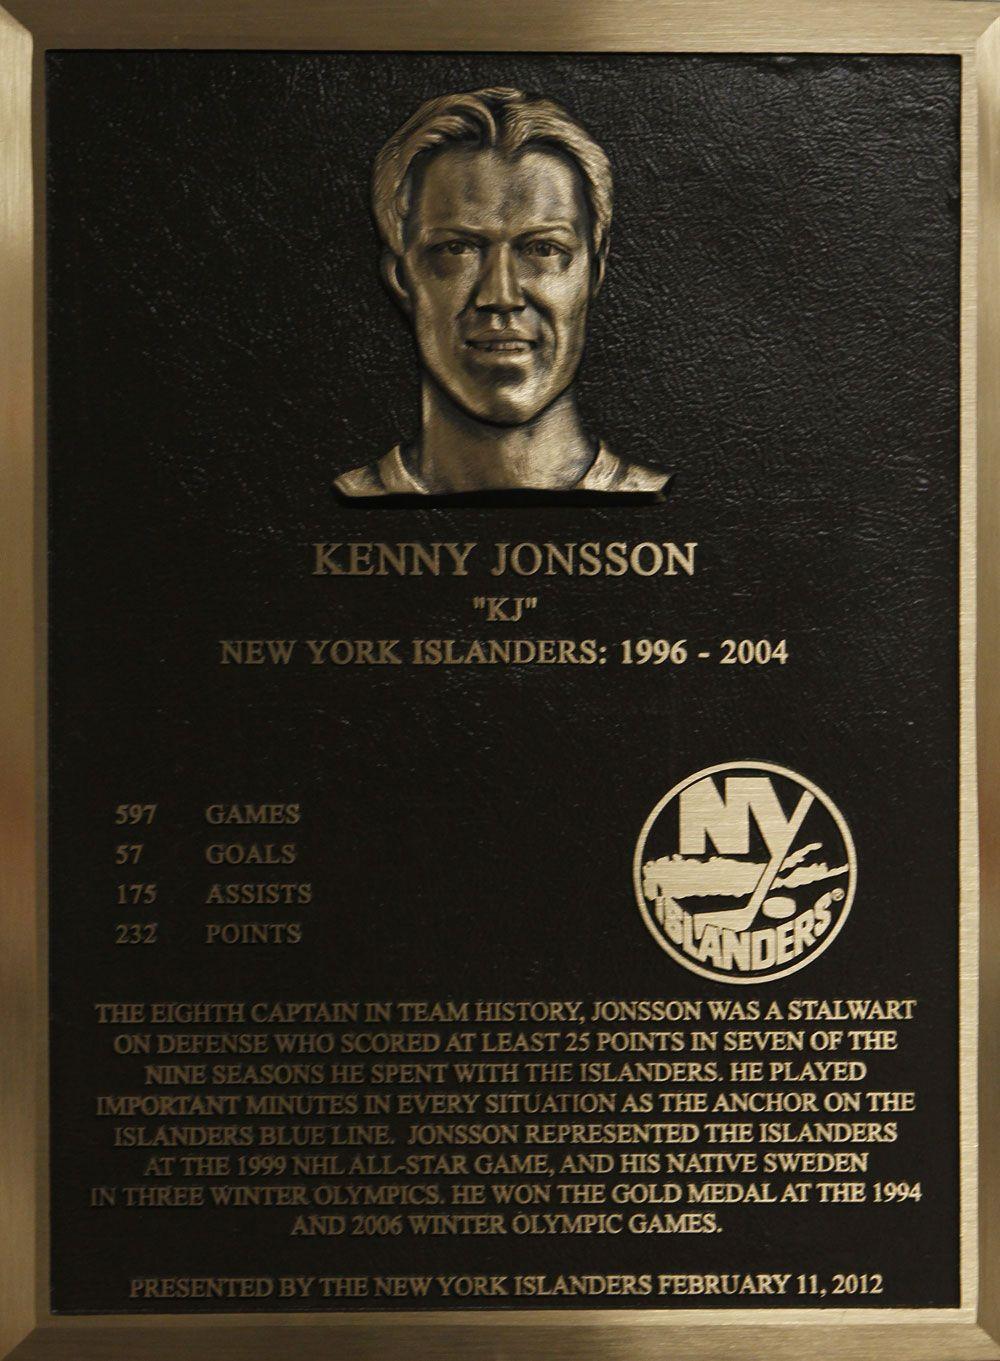 Kenny Jonsson S Hall Of Fame Plaque New York Islanders Hockey Players Favorite Team